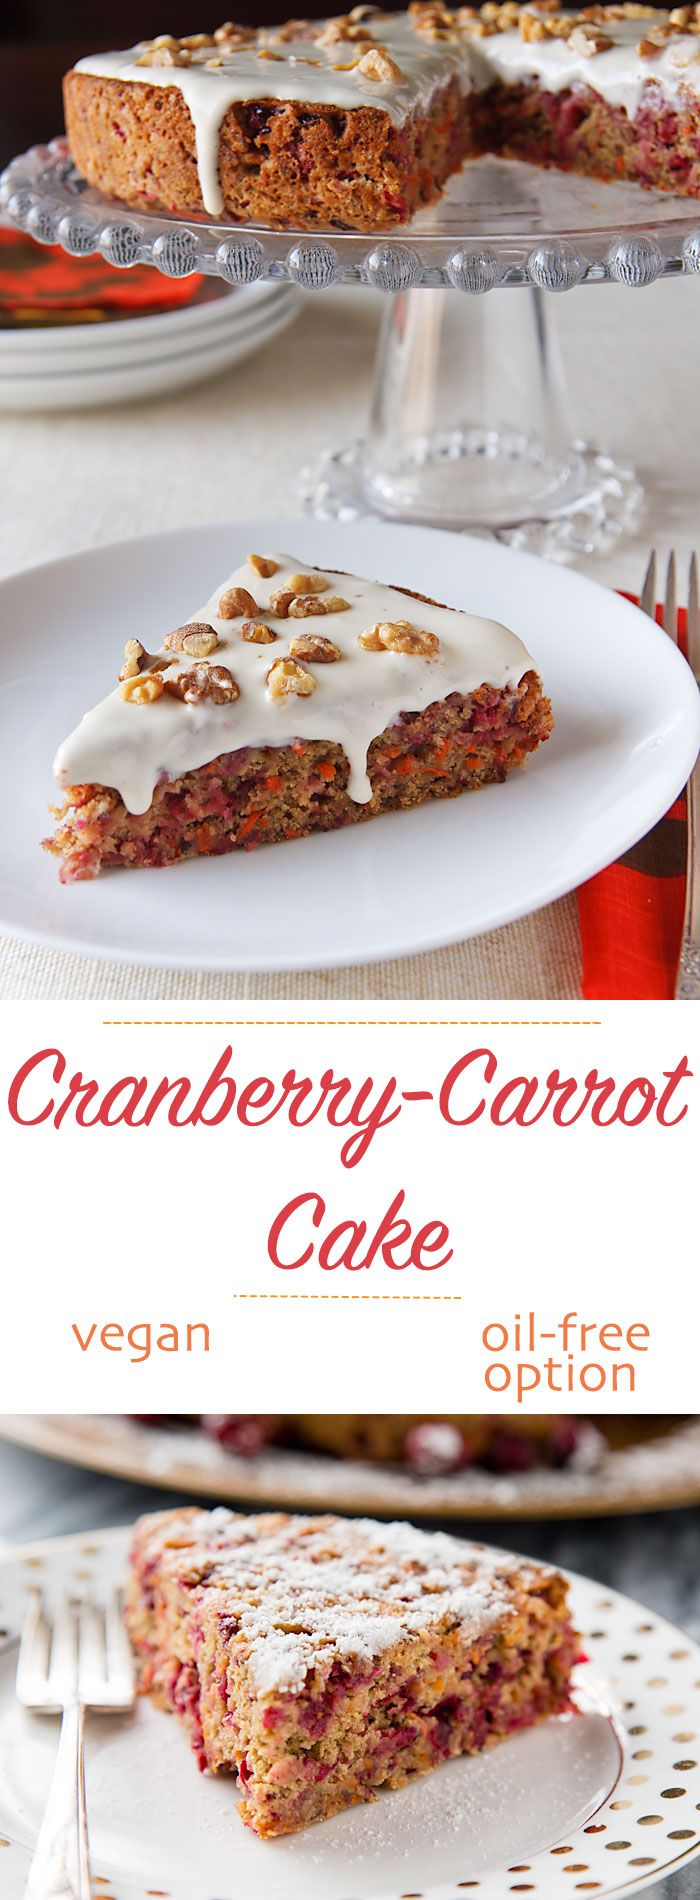 CranberryCarrot Cake Recipe Cranberry cake, Vegan